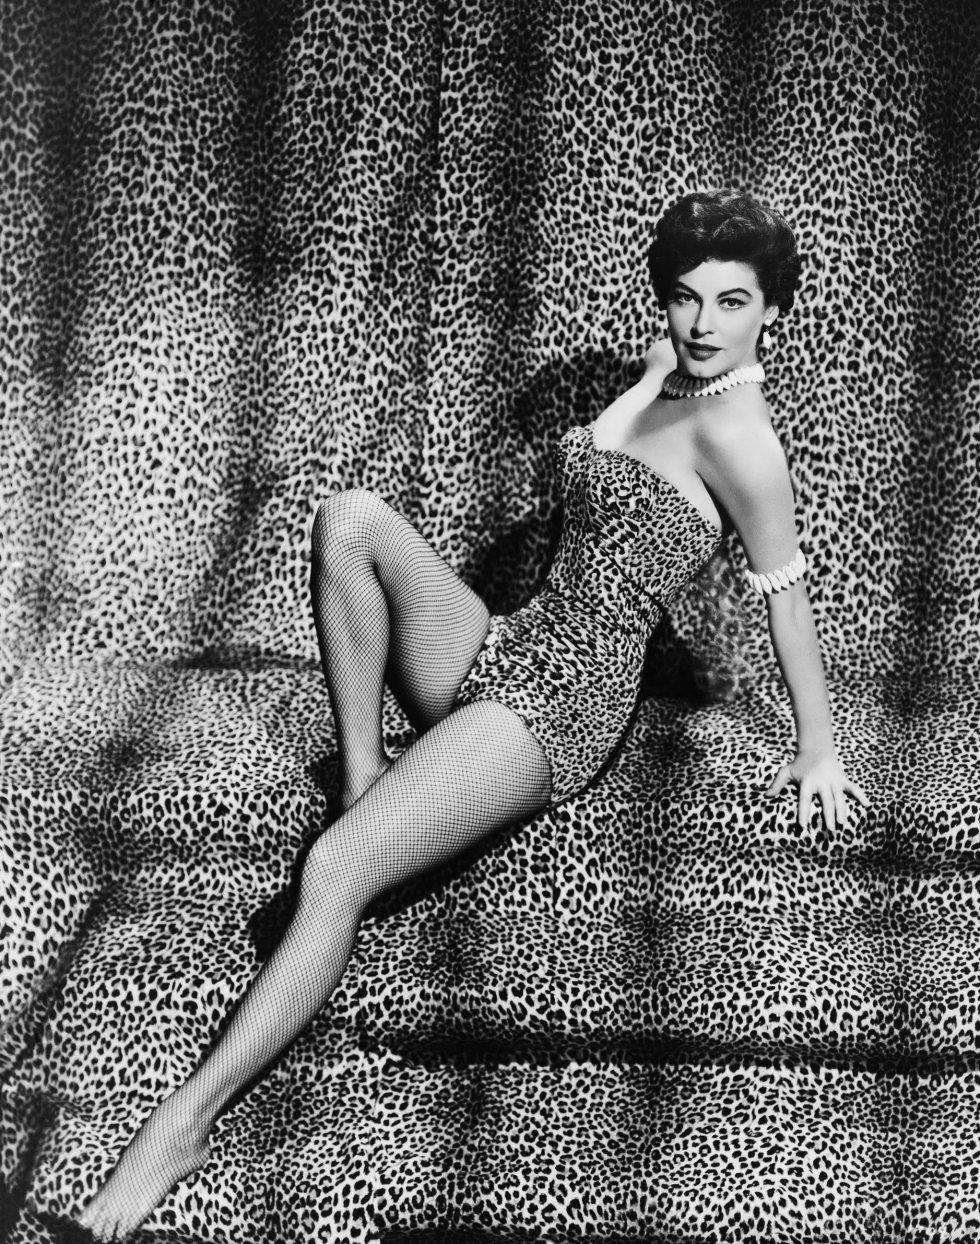 Ava Gardner, exótica con un traje de baño de leopardo.